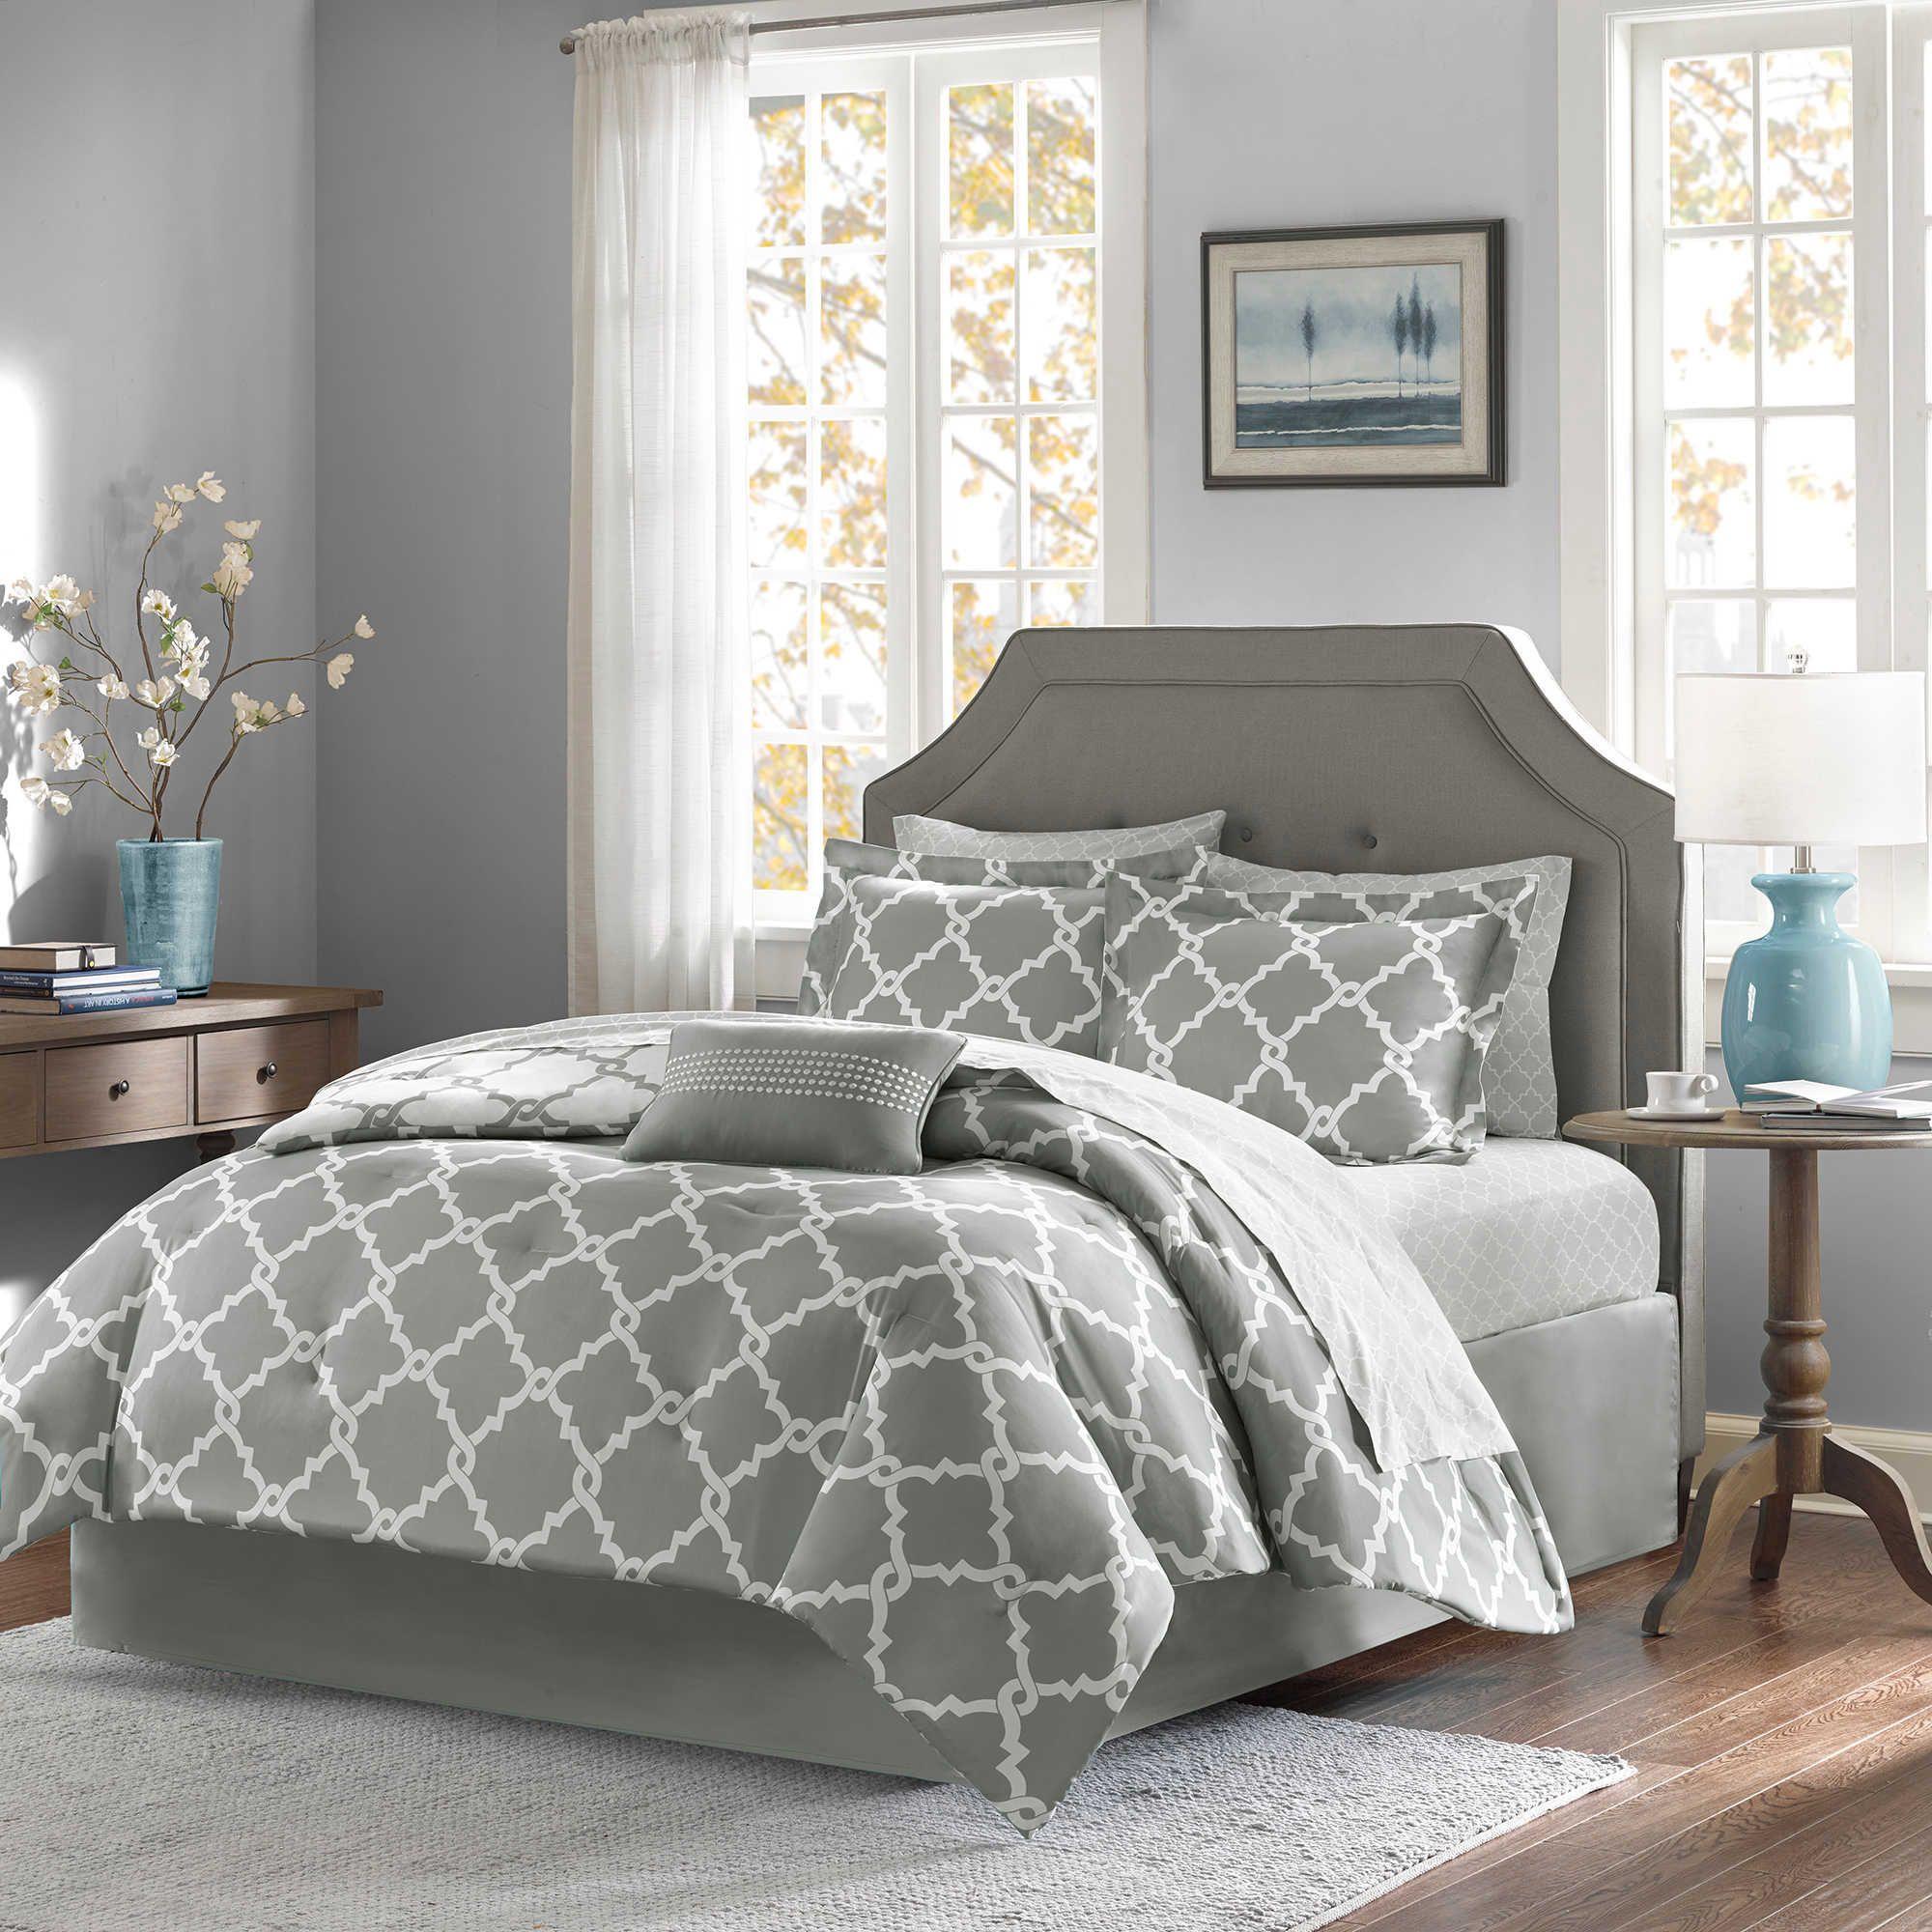 Madison Park Essentials Merritt 9 Piece Reversible King Comforter